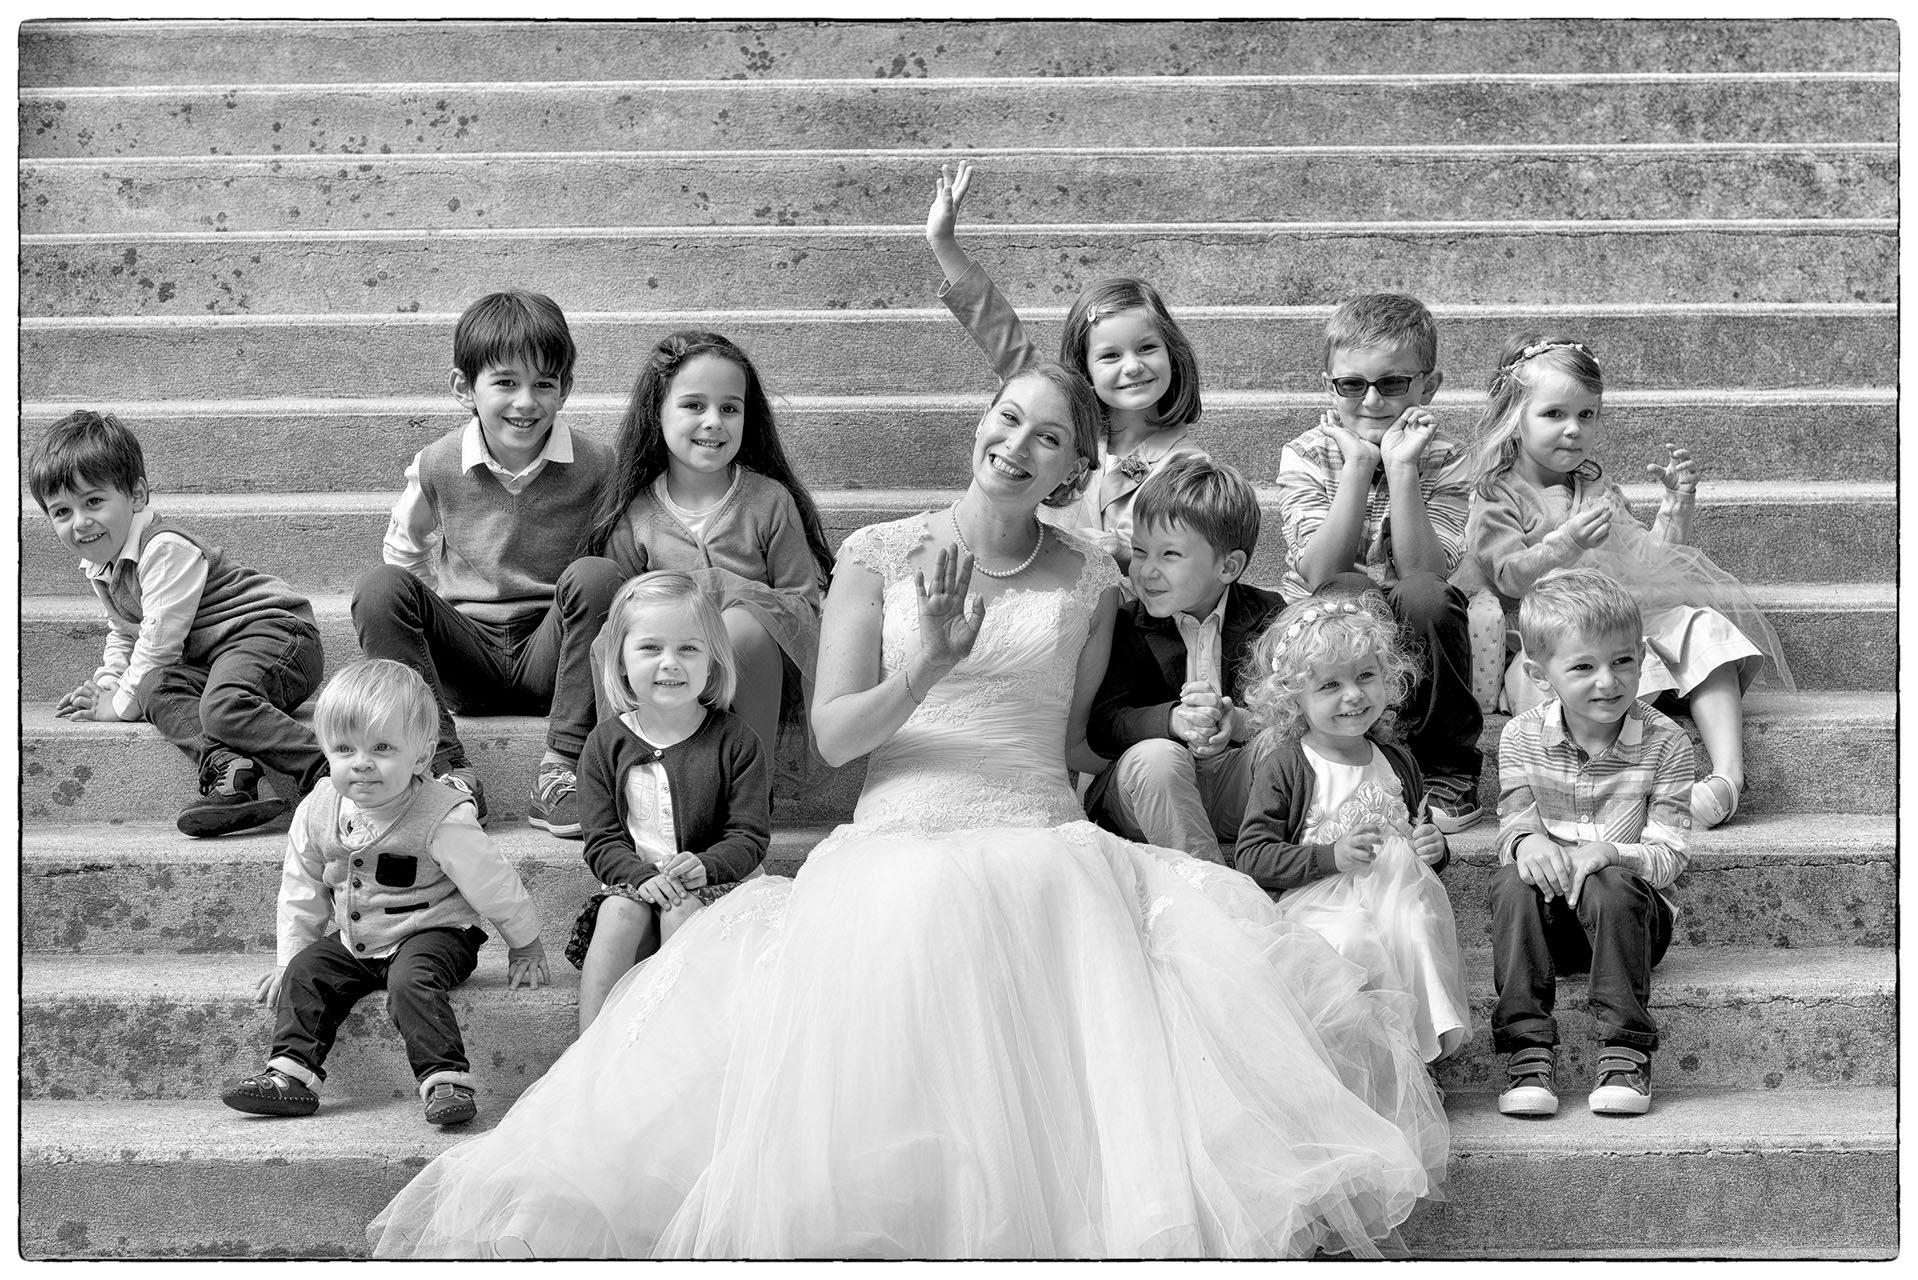 photos-mariage-ile-de-france-val-de-marne-marie-thibaud